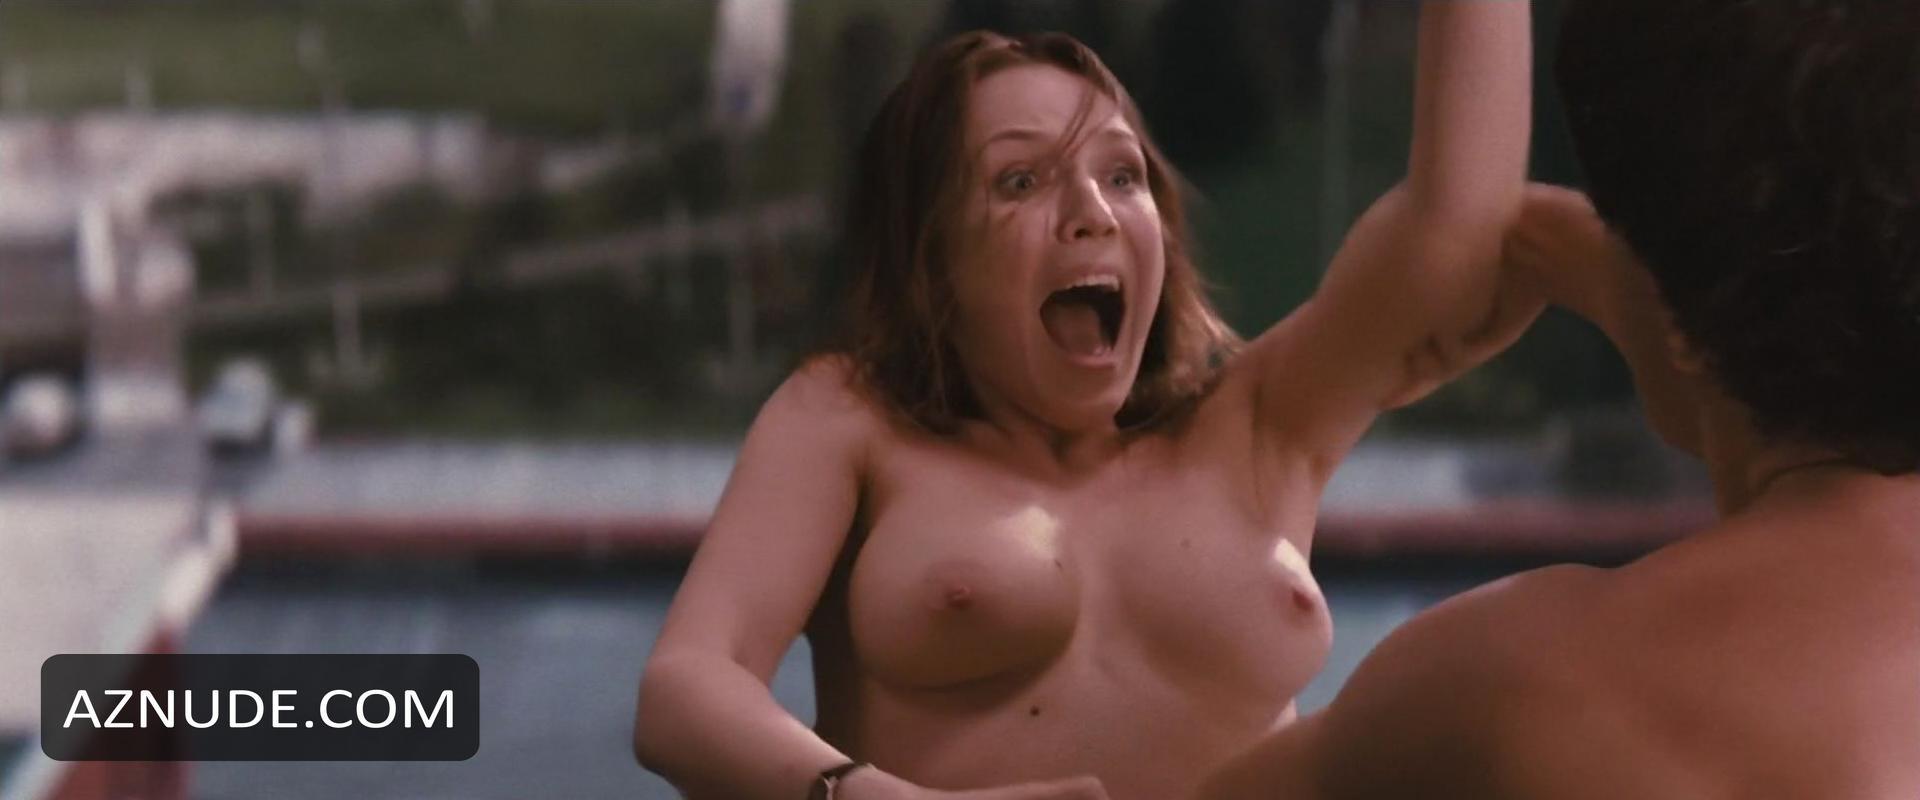 Boob And Butt Porn